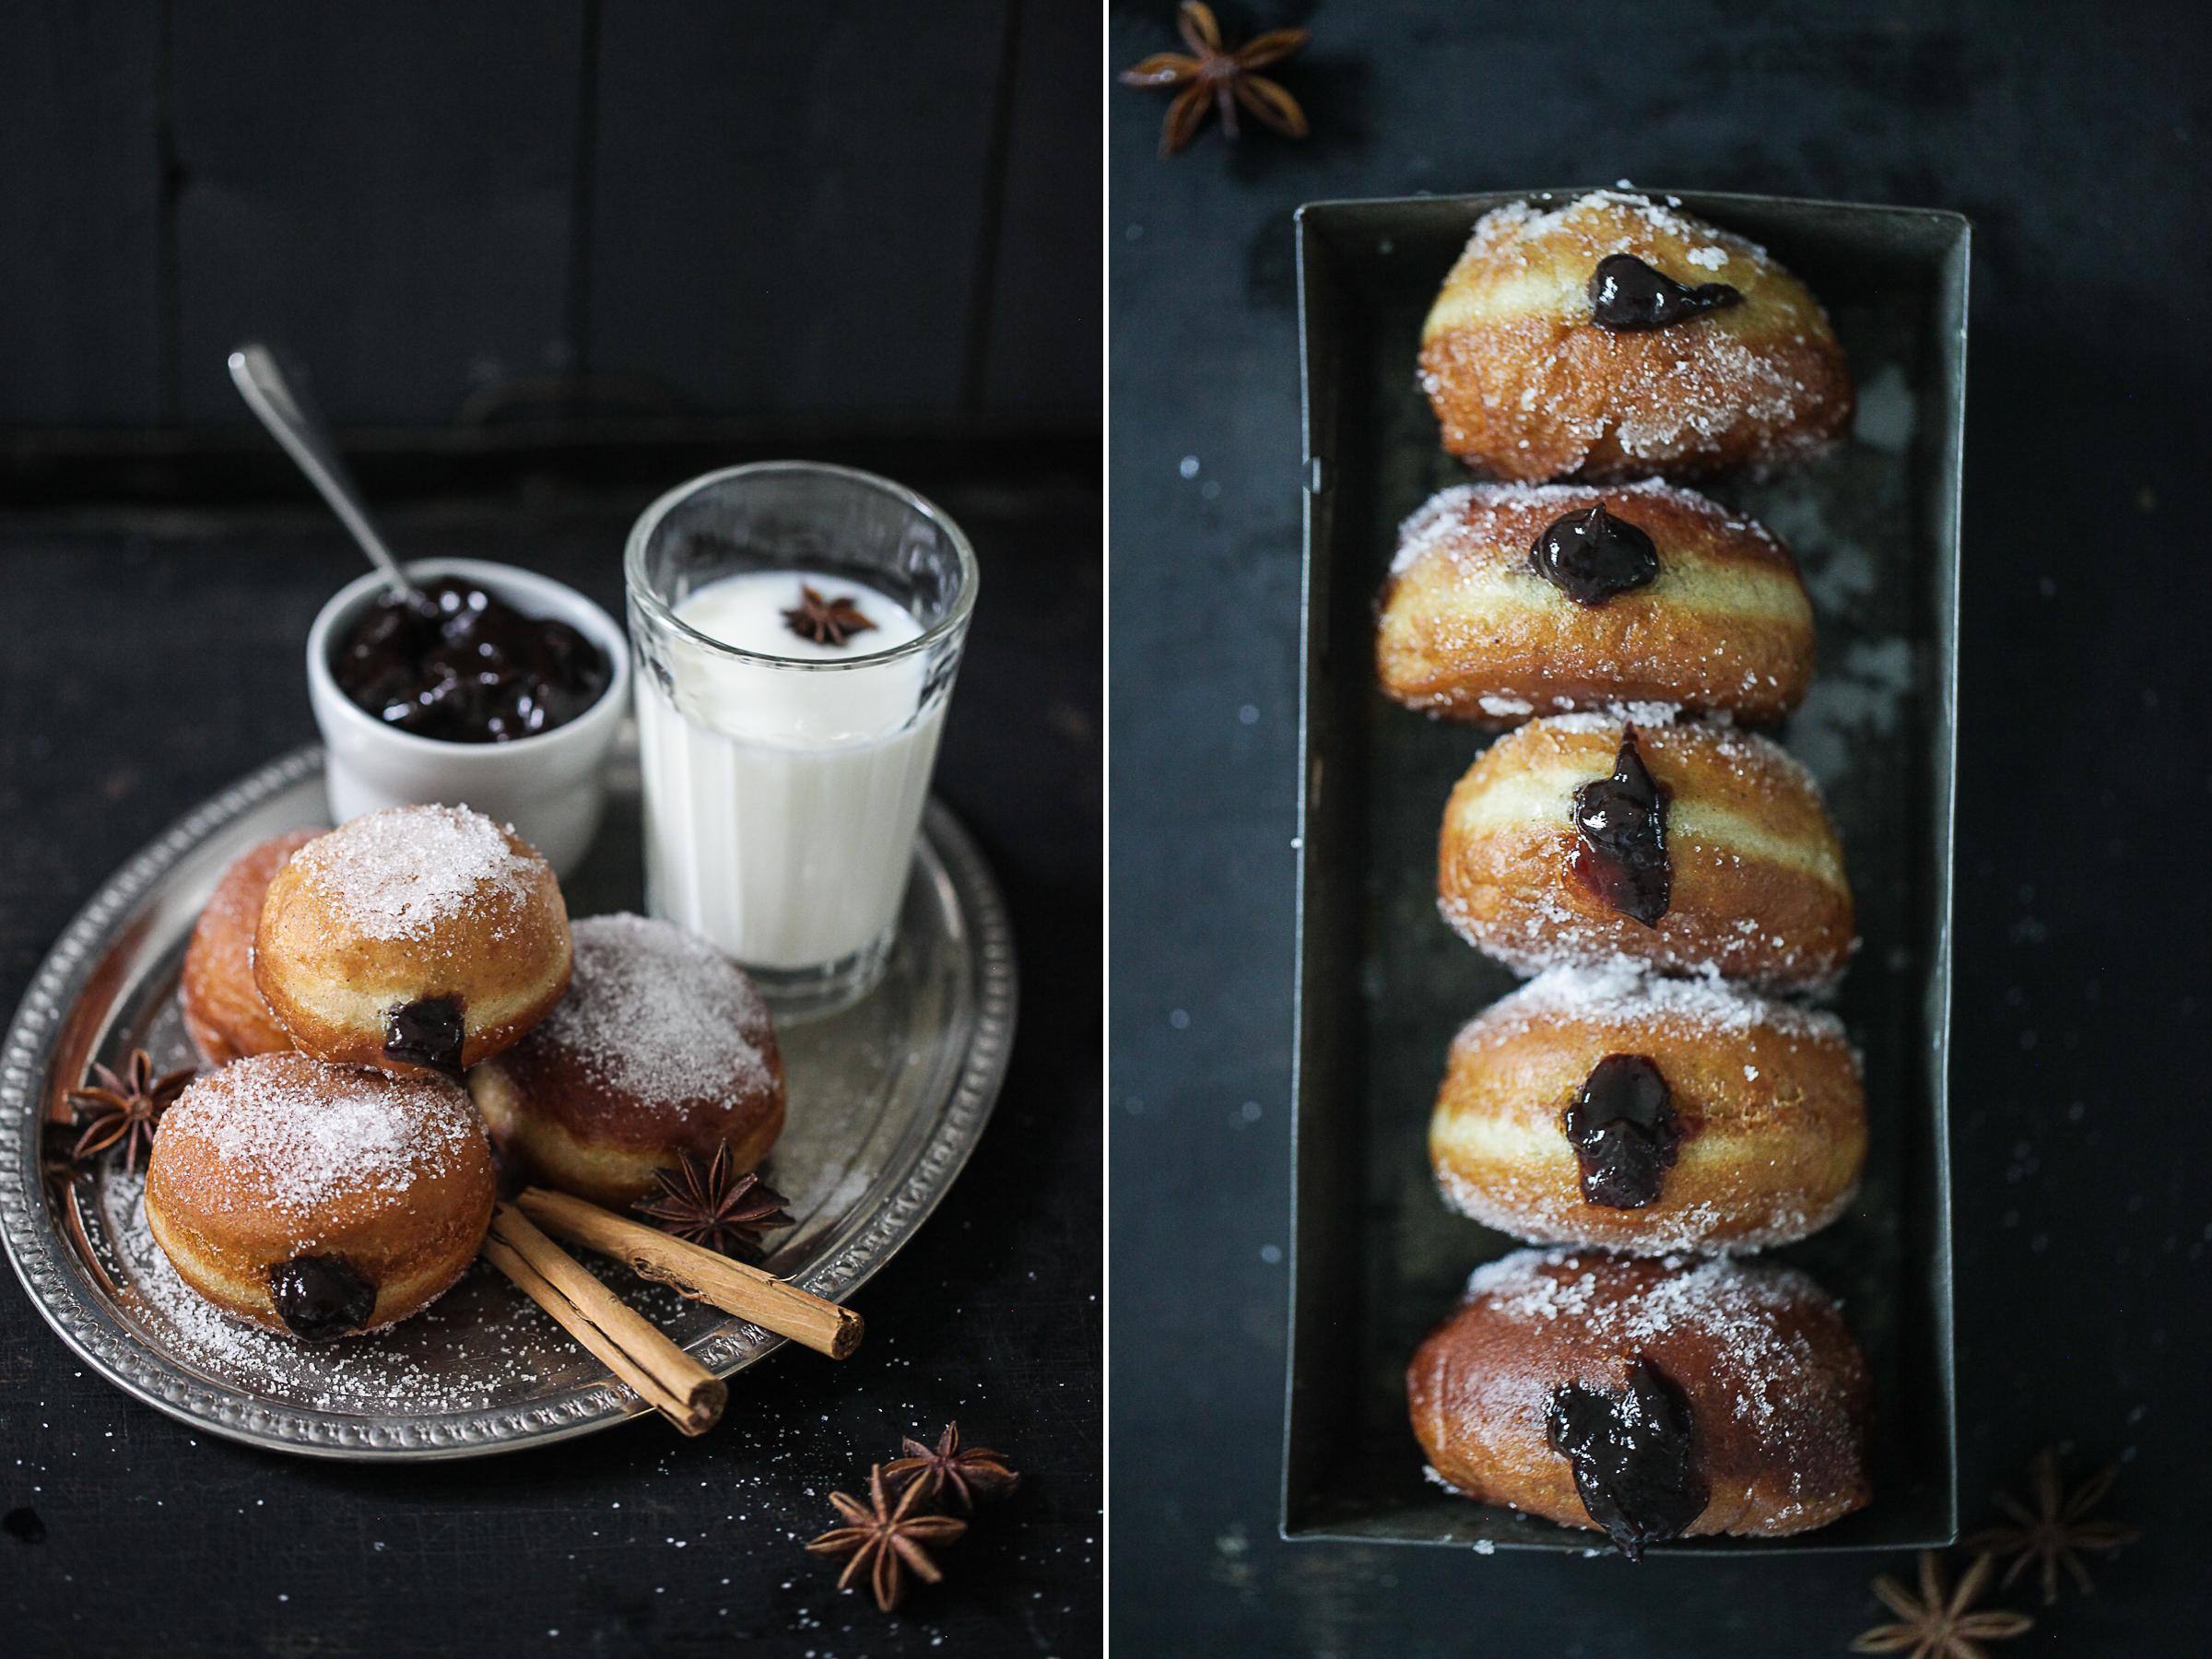 Rezept Berliner Spekulatiusberliner Adventsgebäck Weihnachtsbäckerei Zuckerzimtundliebe Spekulaas Speculaas Donuts